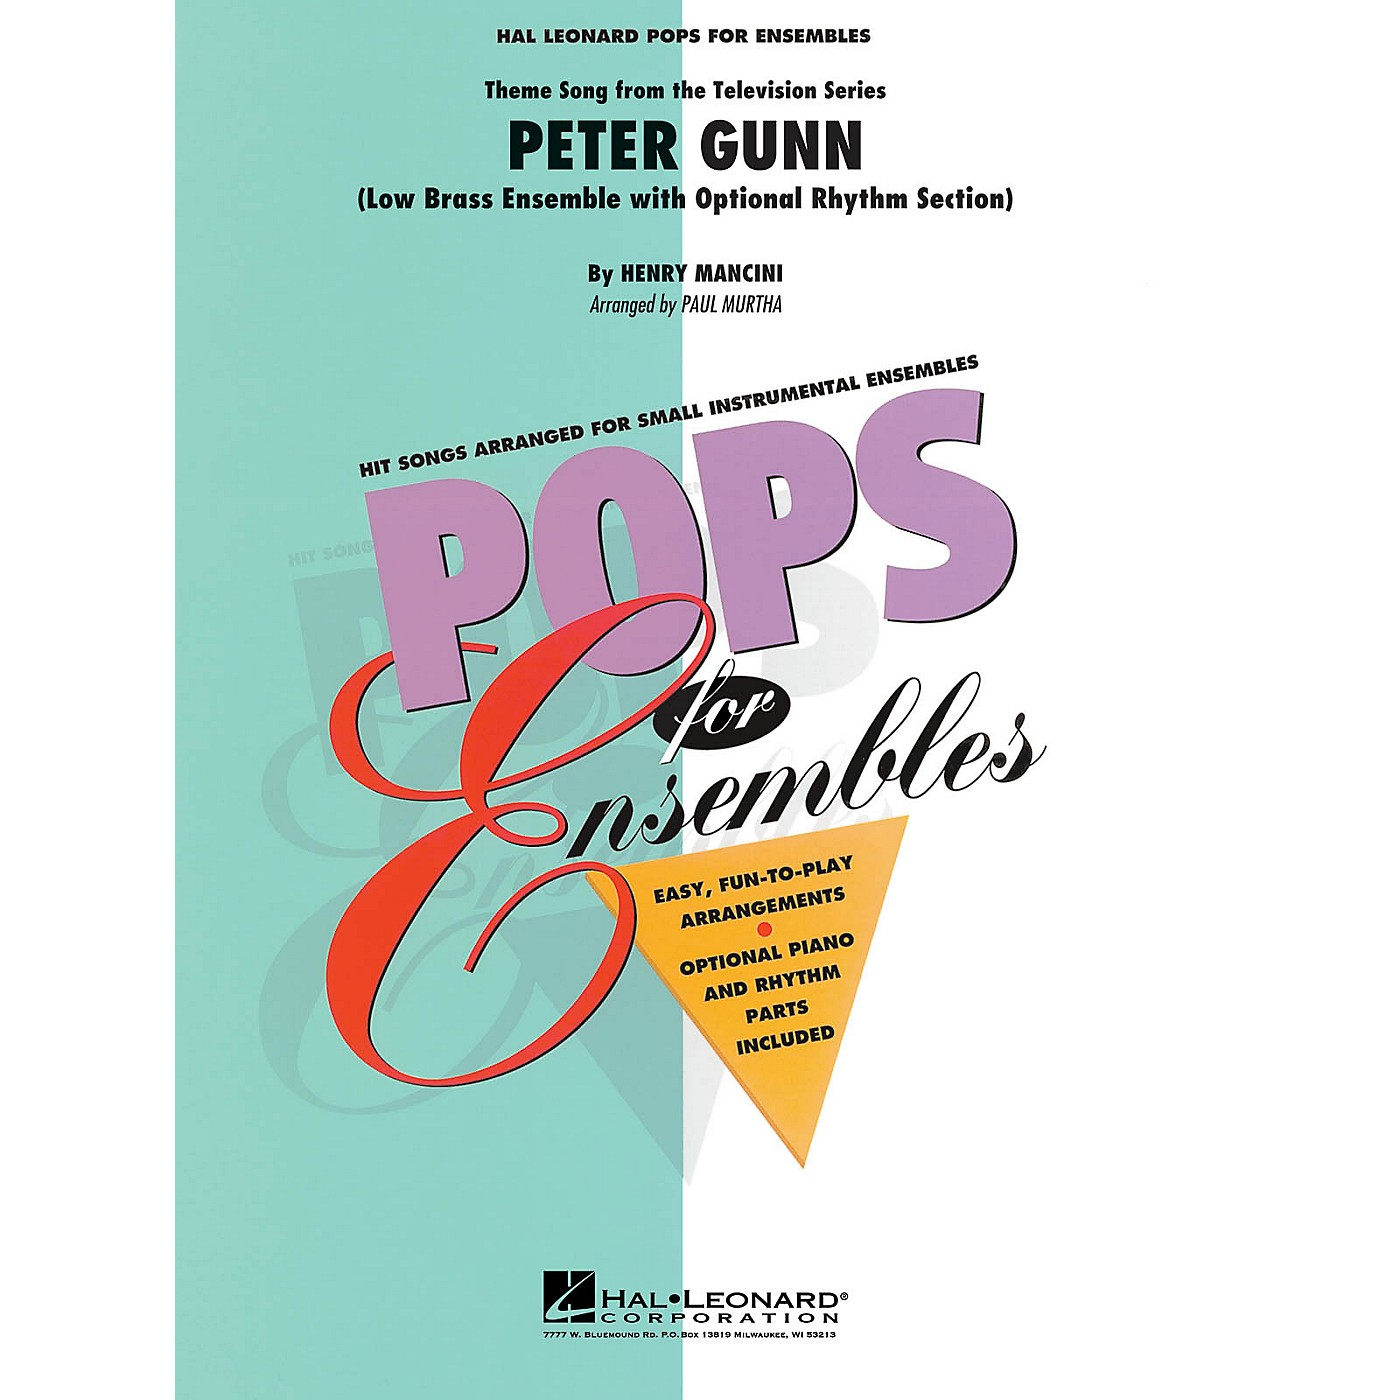 Hal Leonard Peter Gunn (Low Brass Ensemble (opt. rhythm section)) Concert Band Level 2-3 Arranged by Paul Murtha thumbnail